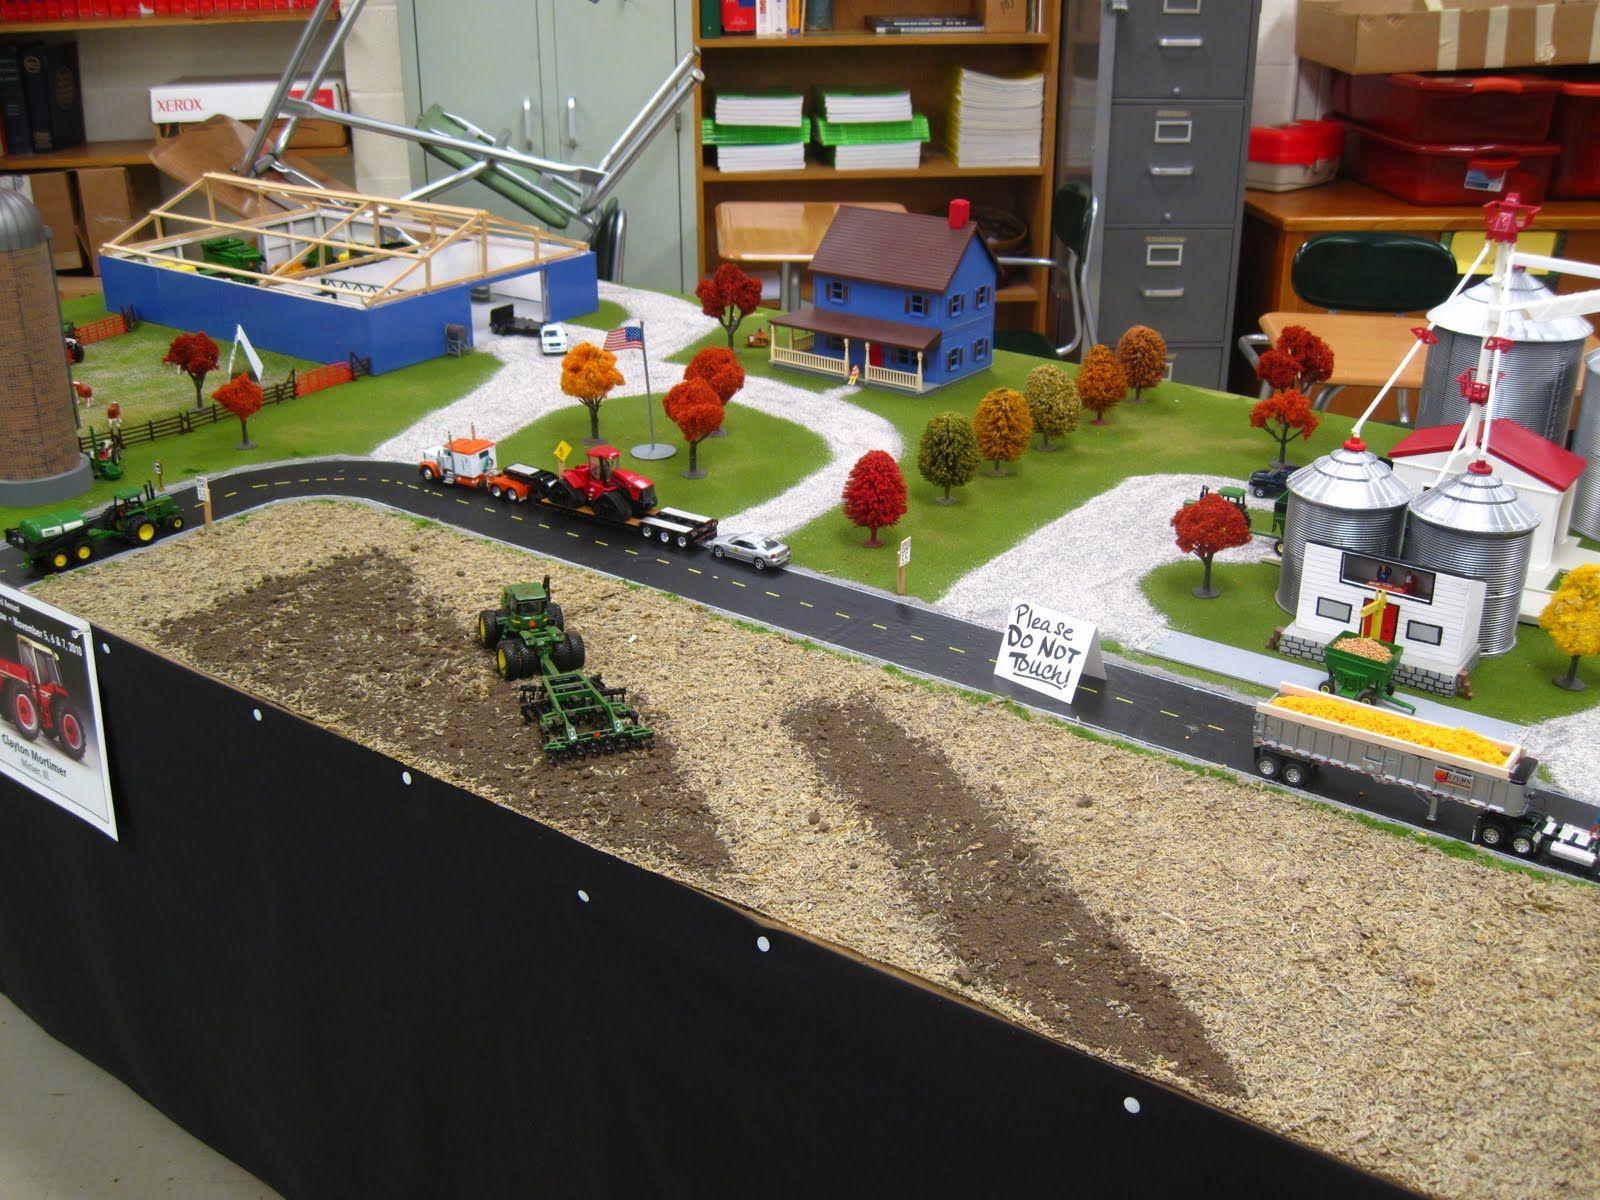 Tractors Ideas Display Toy